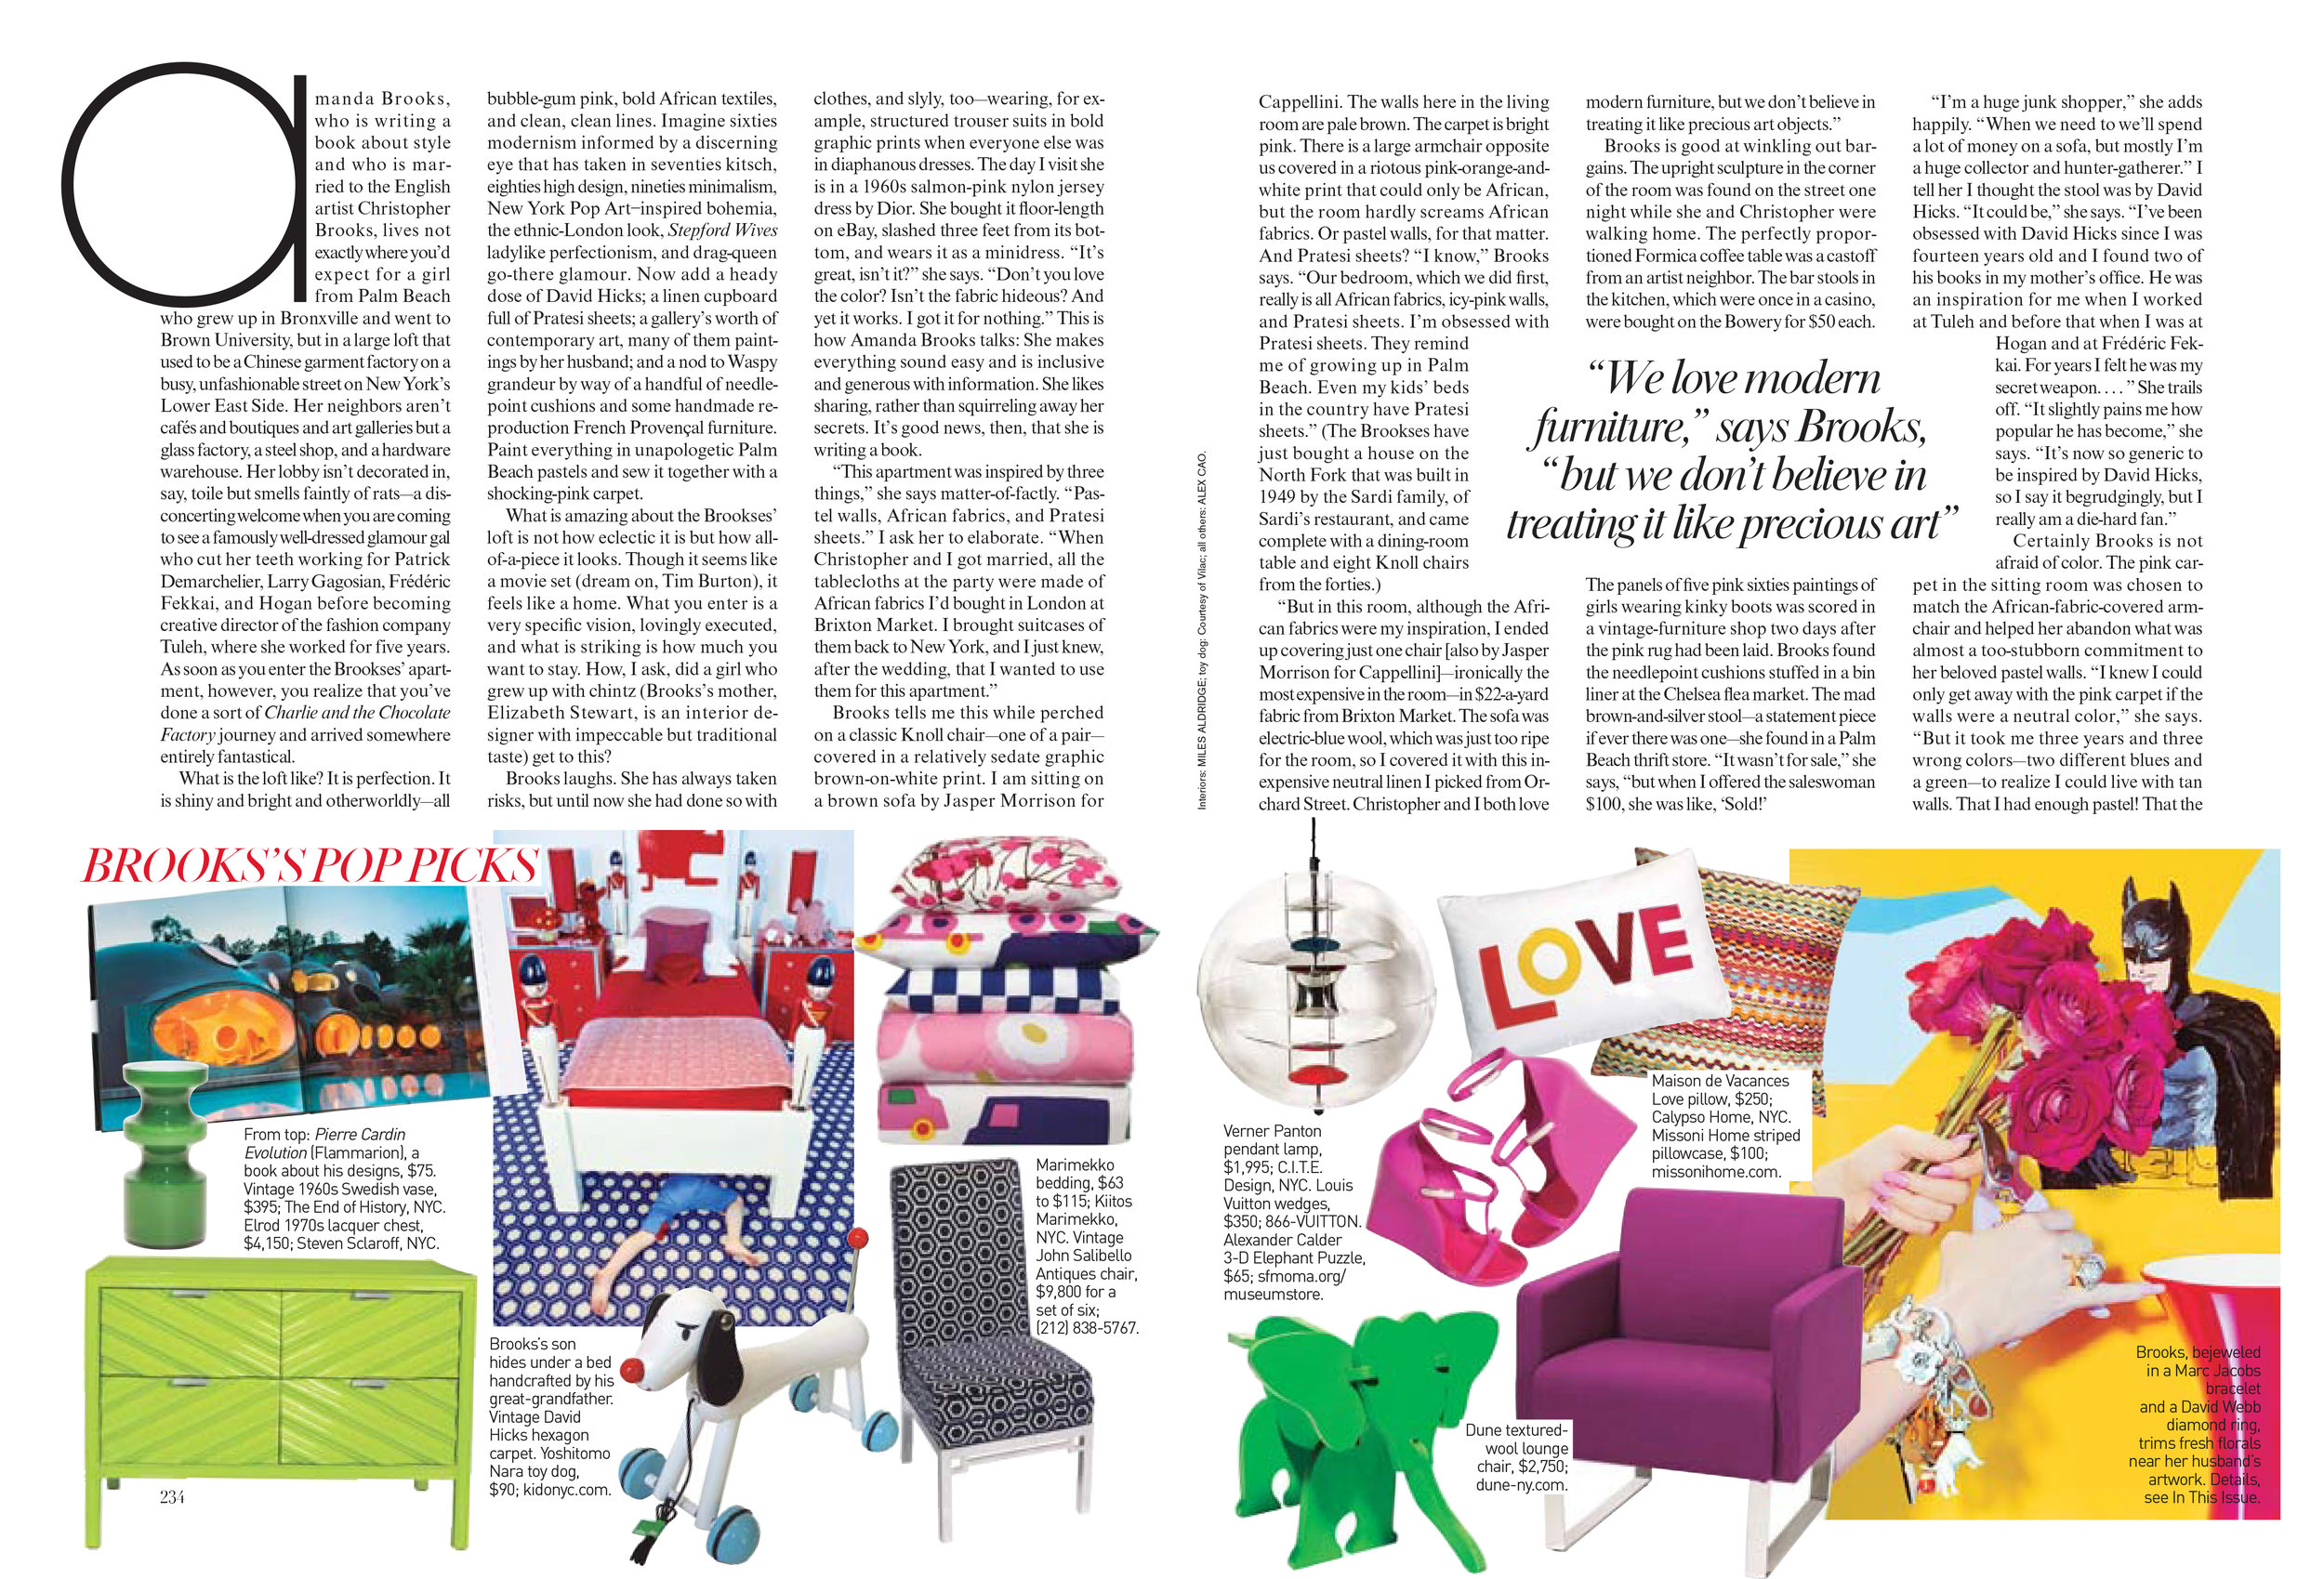 Vogue-Living103.jpg